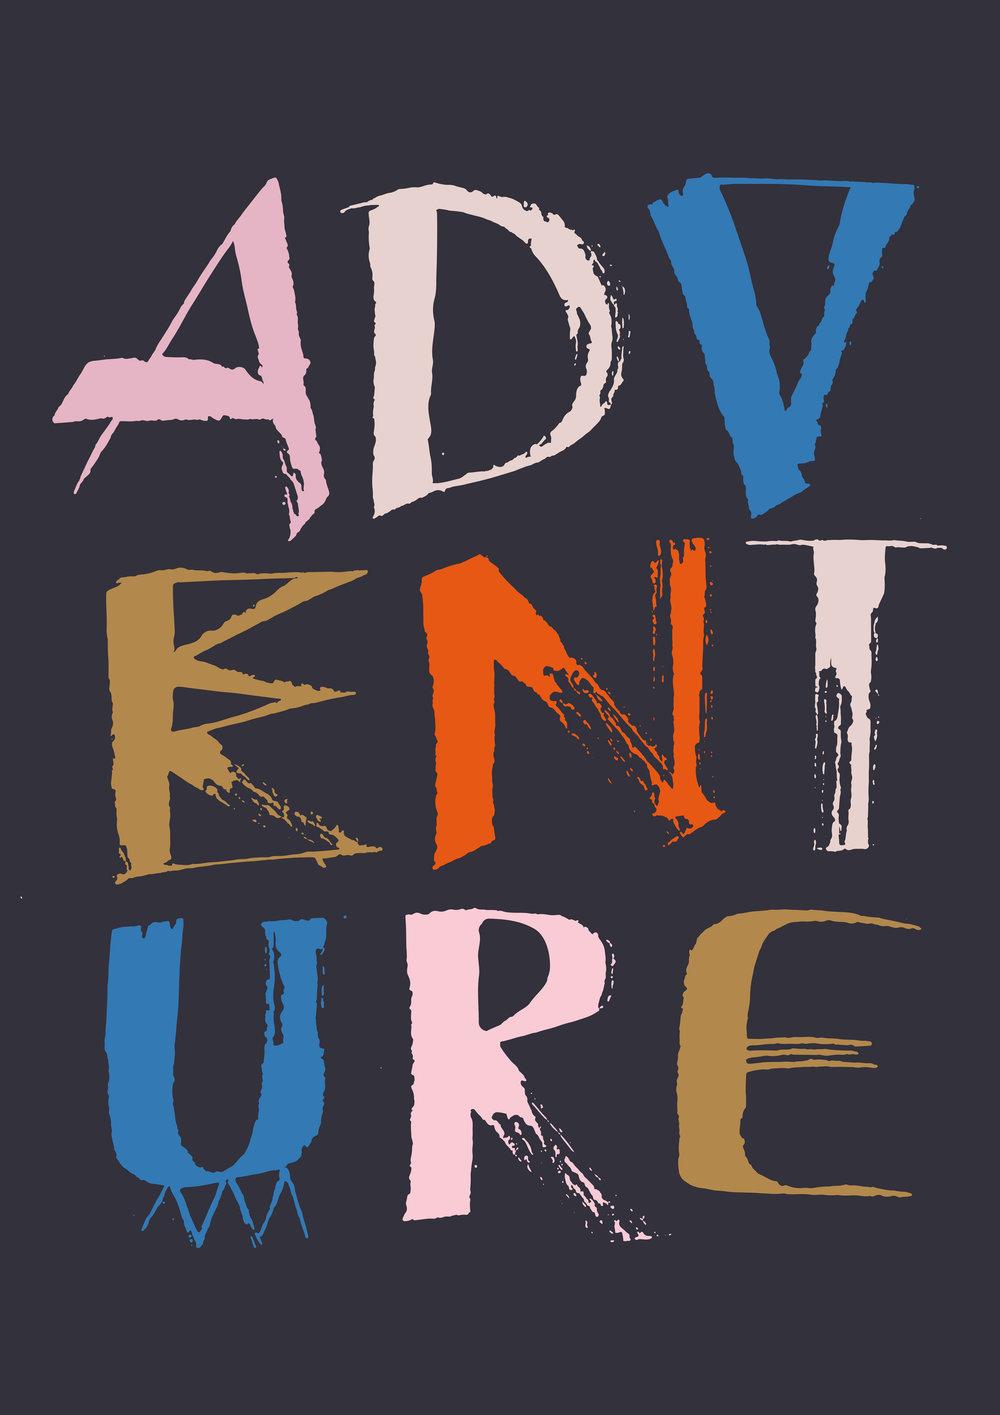 a4-adventureprint-gabriellabuckingham.jpg